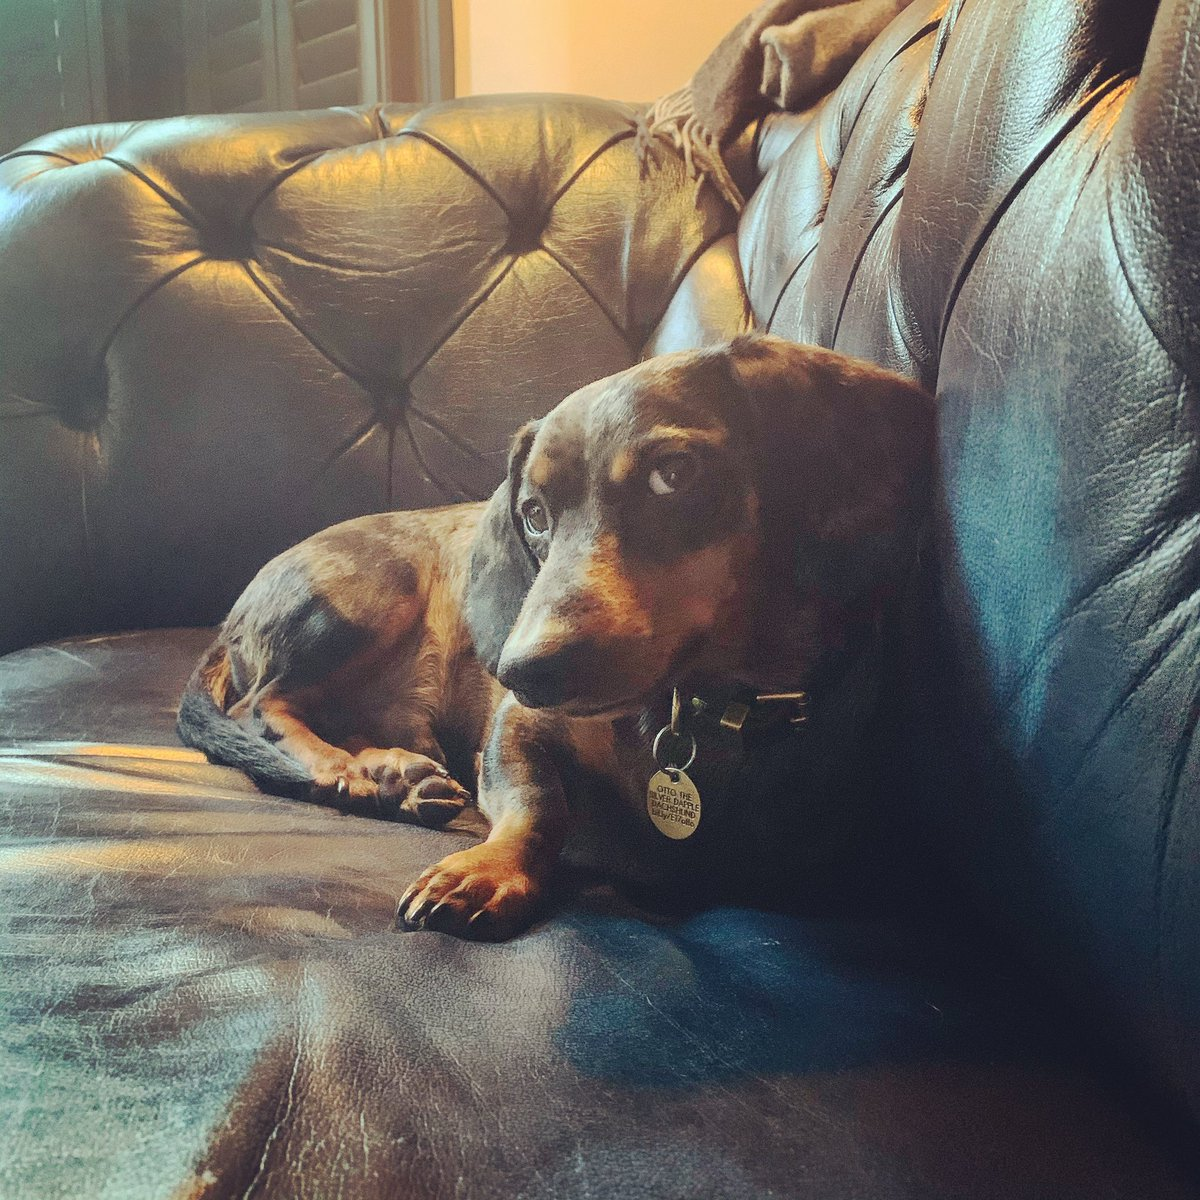 Friday morning sofa suspicion 👀 🌭🐶🐾😊 #sideeye #sofa #sofasausage #sideeye #whatdoyouwant #canihelpyou  #dappleotto #friday #fridaymood https://t.co/5cYe4qdxq8